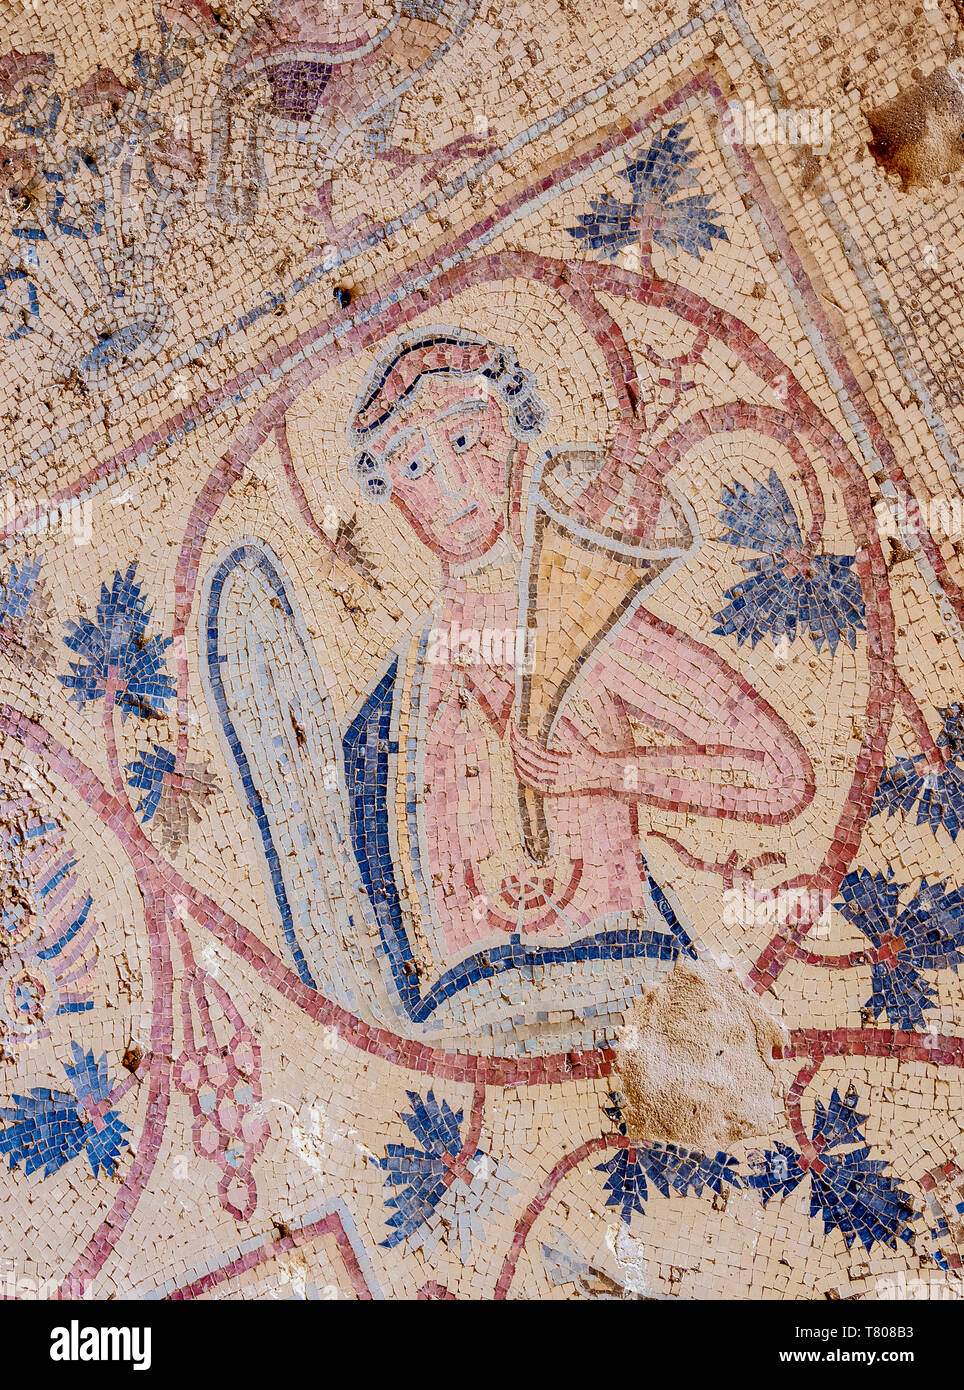 Mosaic floor in Umm ar-Rasas, UNESCO World Heritage Site, Amman Governorate, Jordan, Middle East Stock Photo